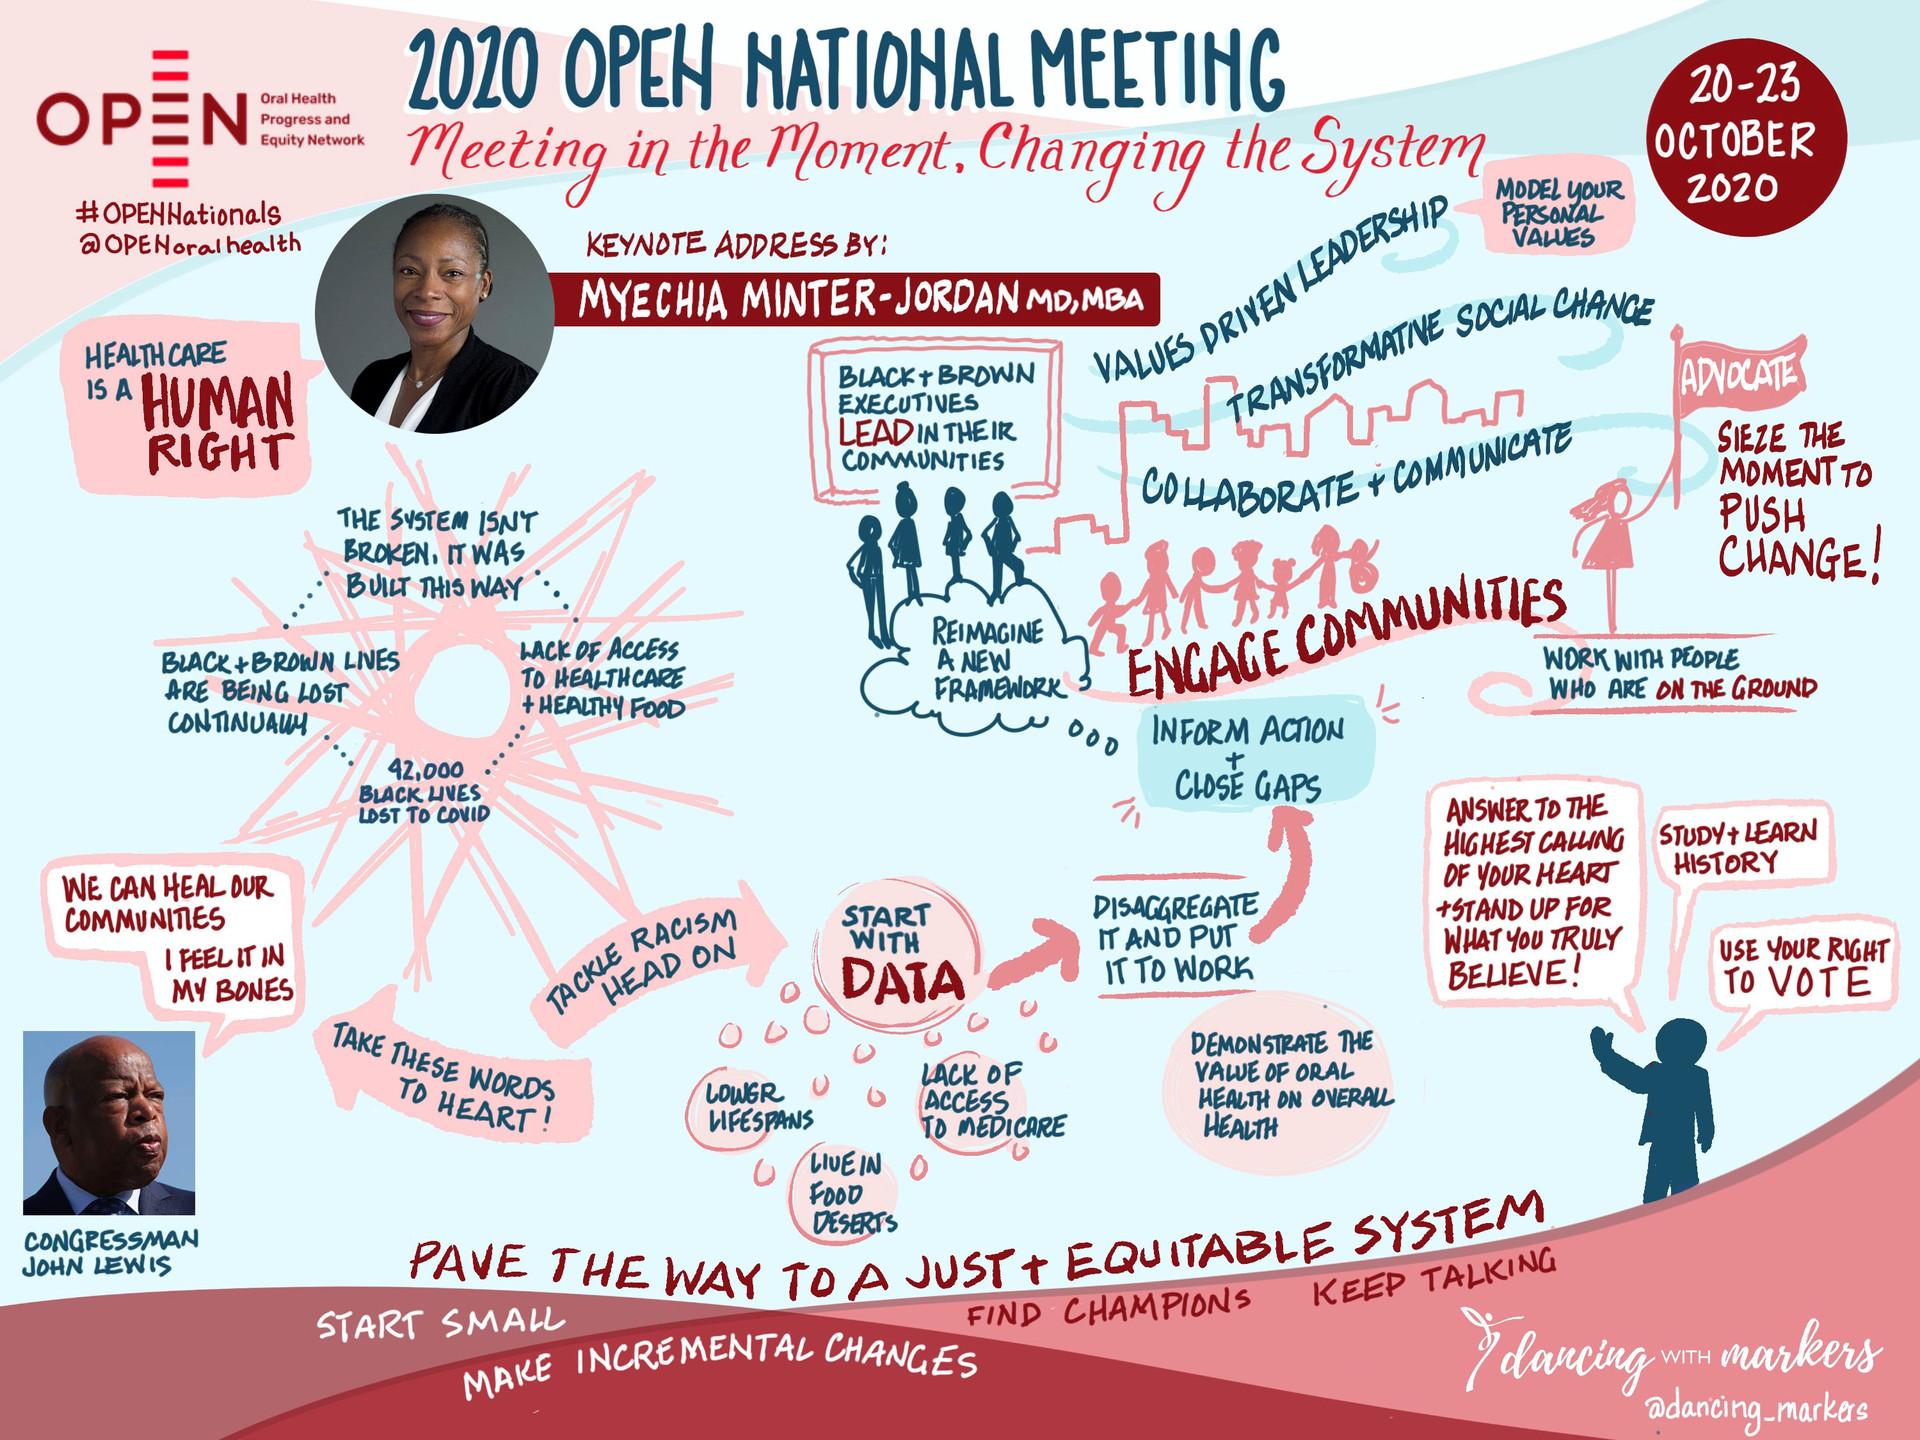 2020 Open National Meeting